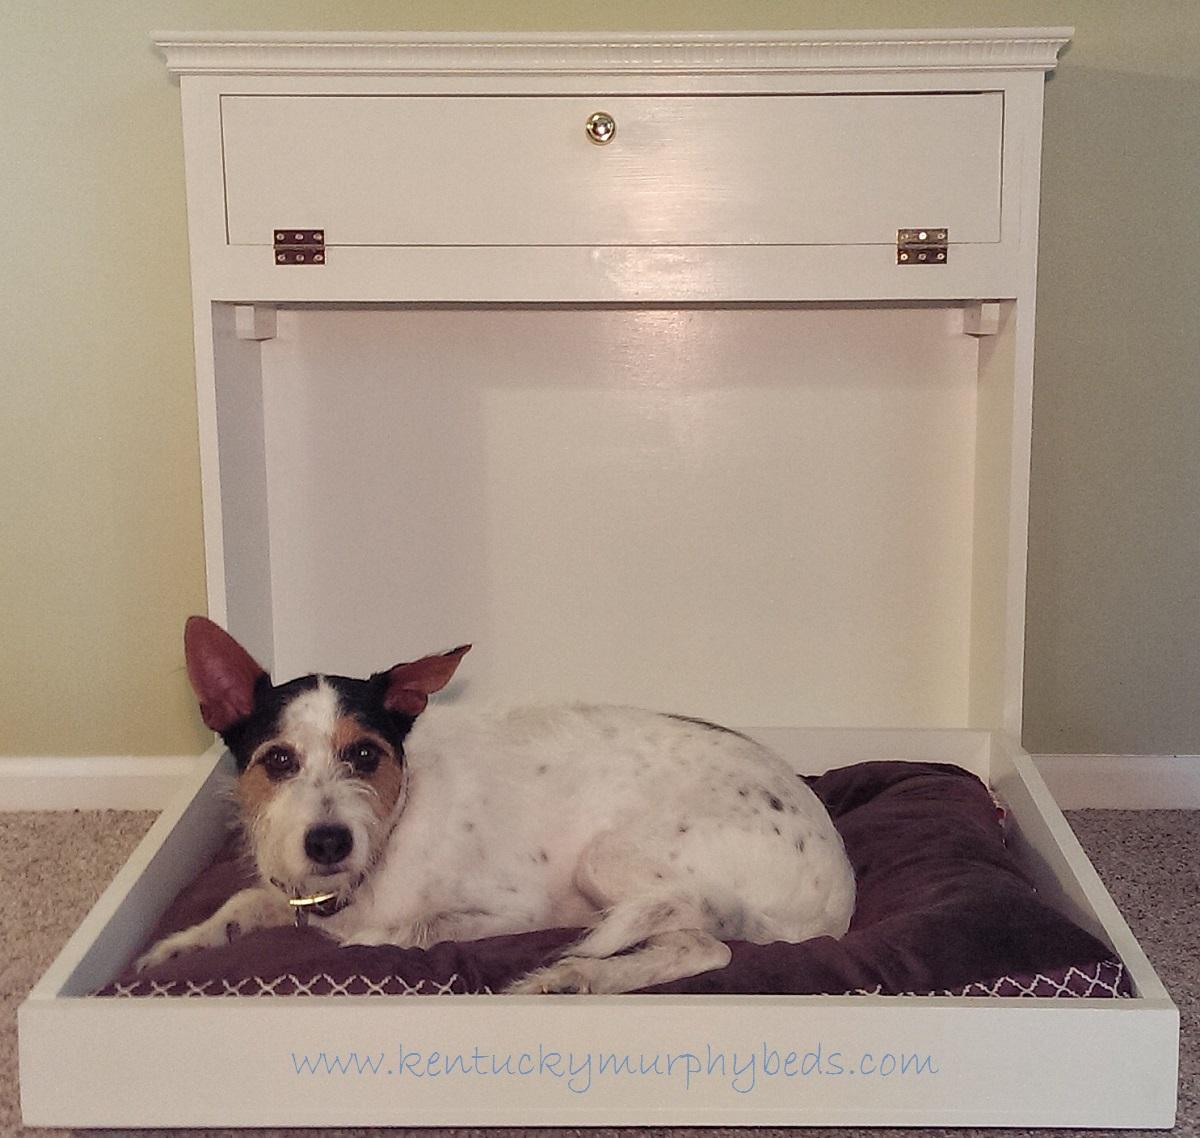 Medium Murphy Dog Bed with White Painted Finish